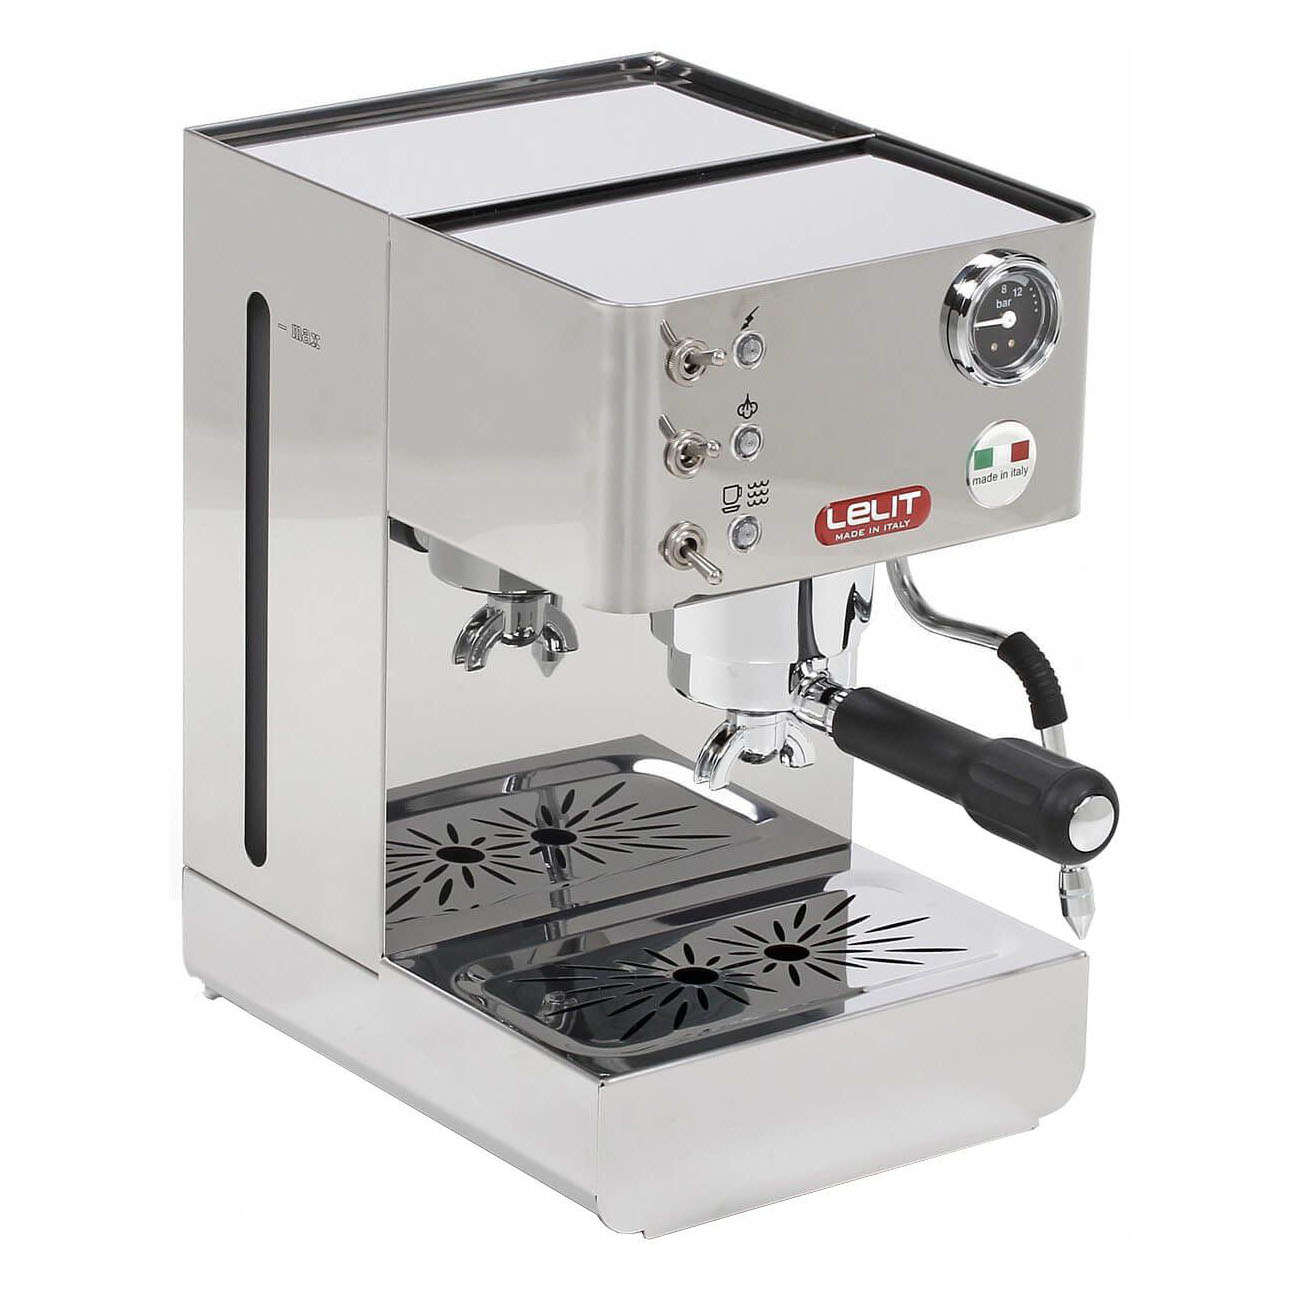 Espressor Lelit PL 41 LEM, 1050 W, 2 L, 15 bar, manometru